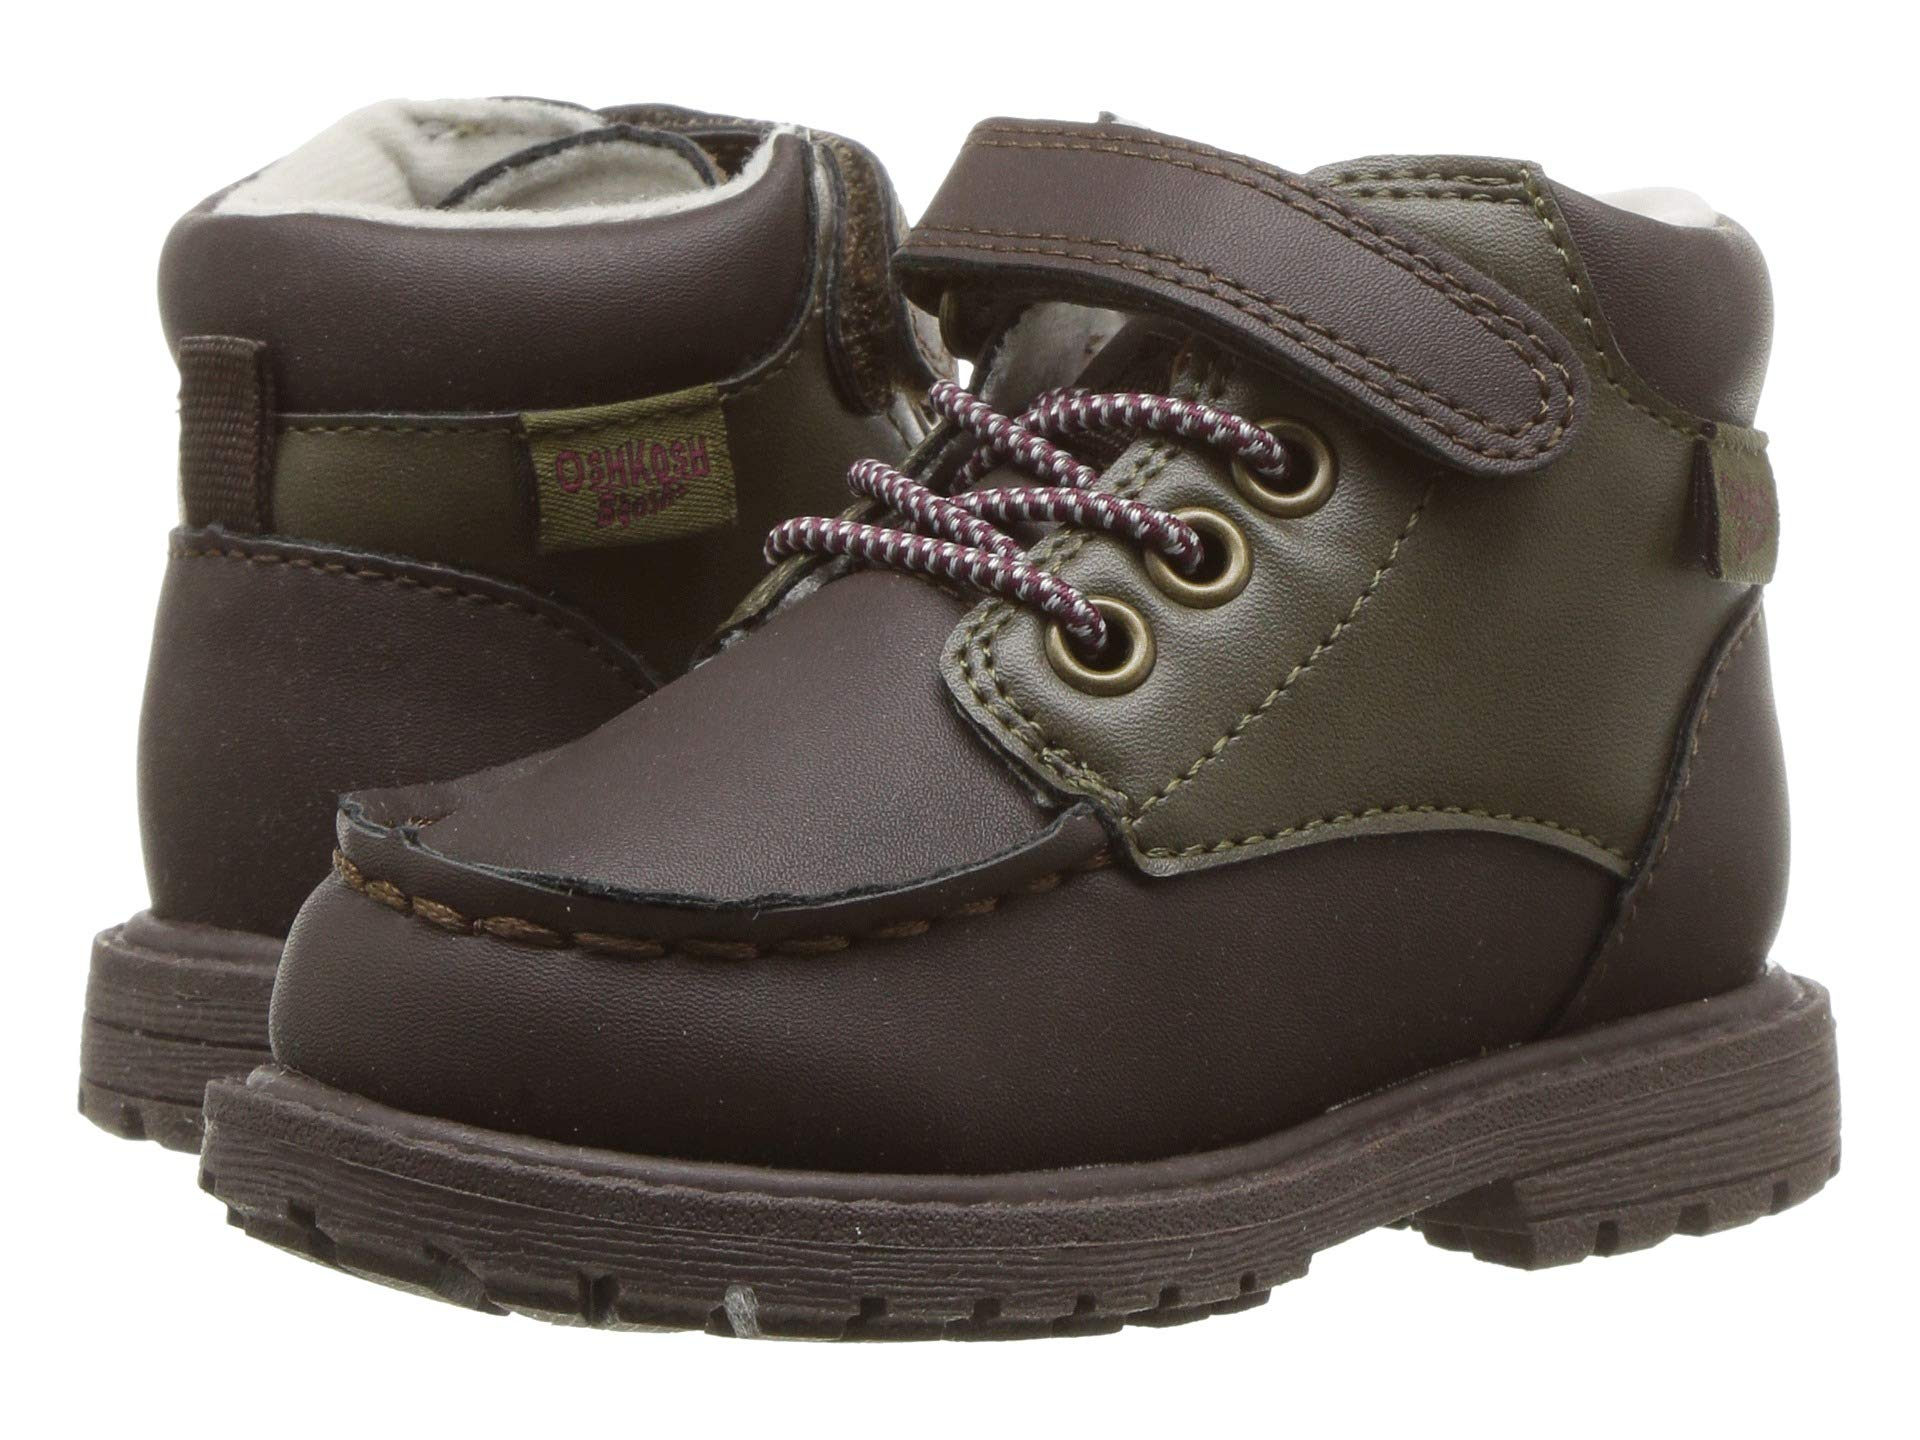 OshKosh B'Gosh Kids' Haslett Ankle Boot